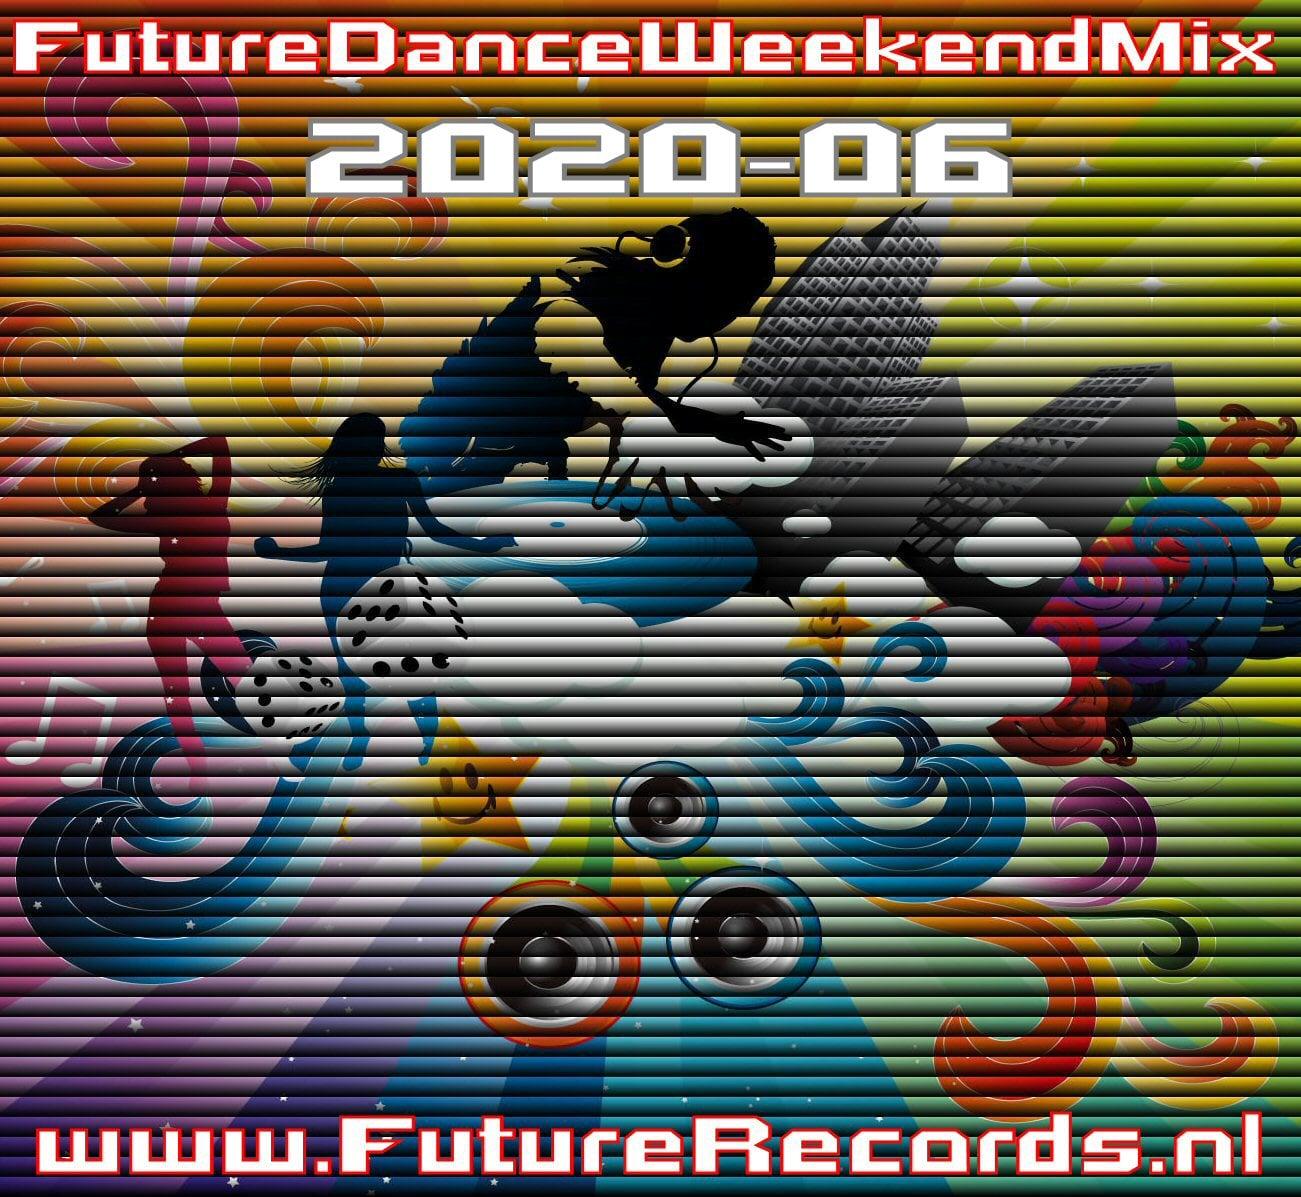 Future Dance Weekend Mix 2020-06